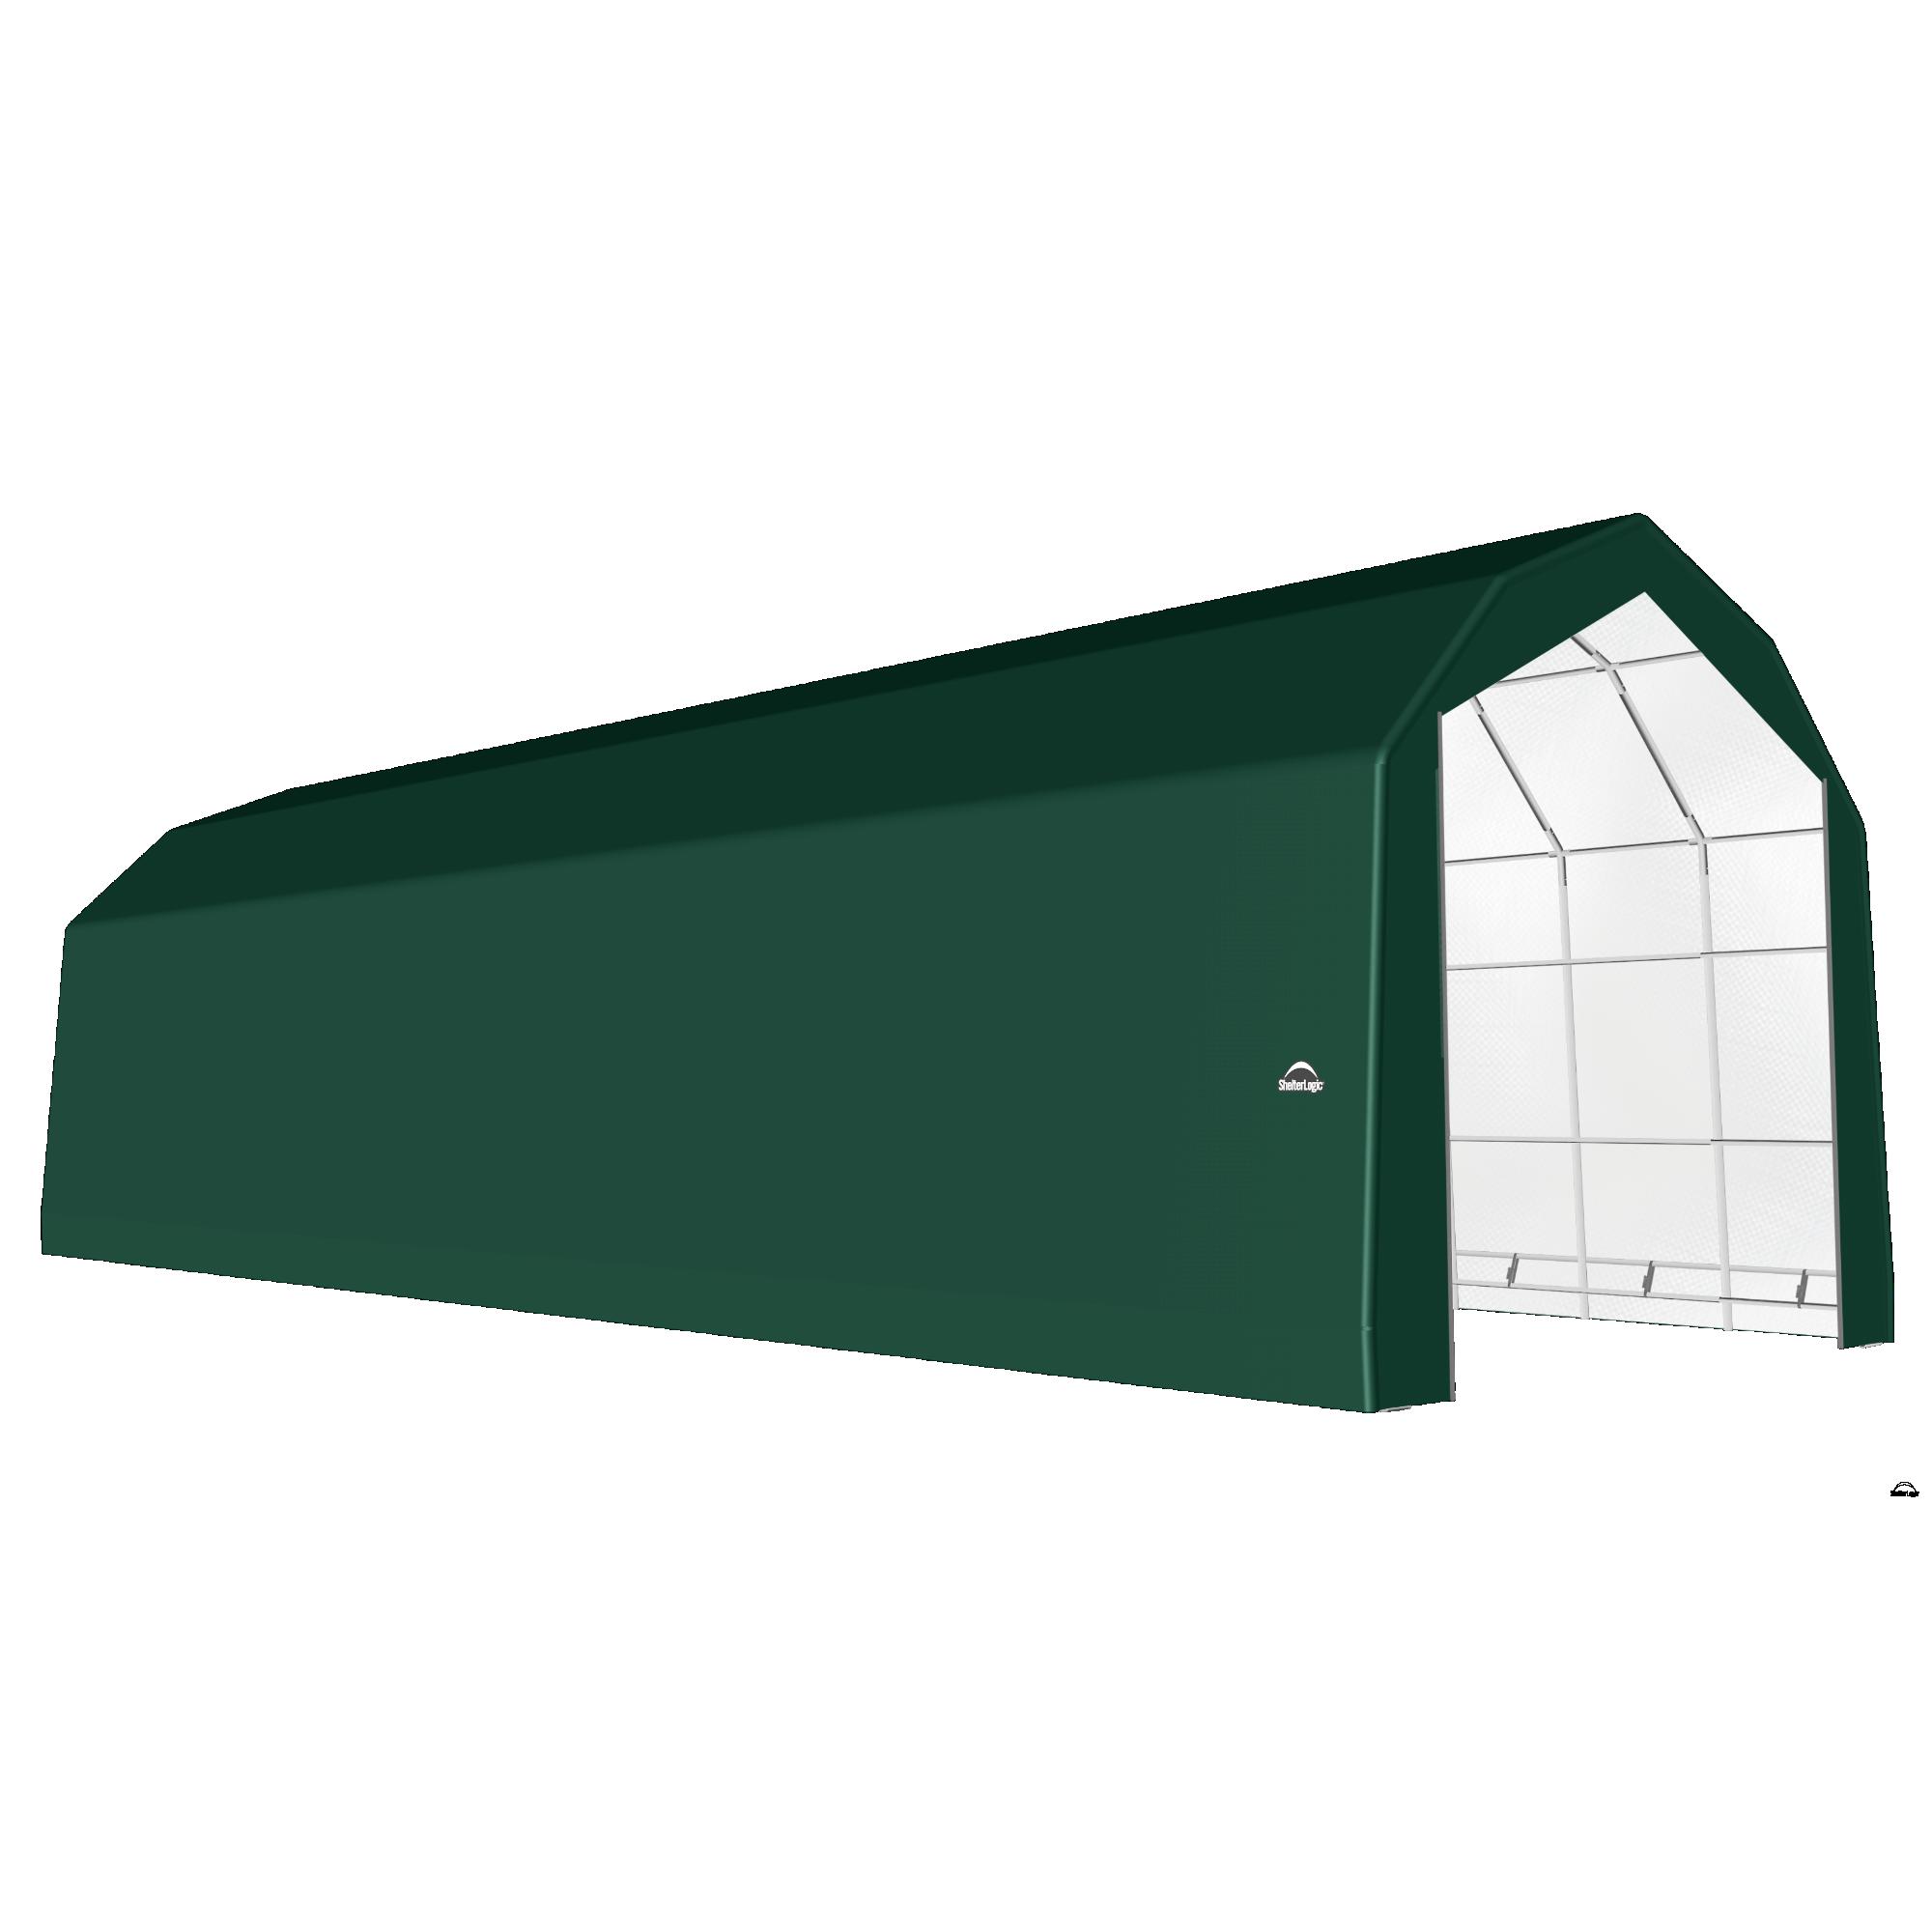 SP Barn 20X56X18 Green 14 oz PE Shelter